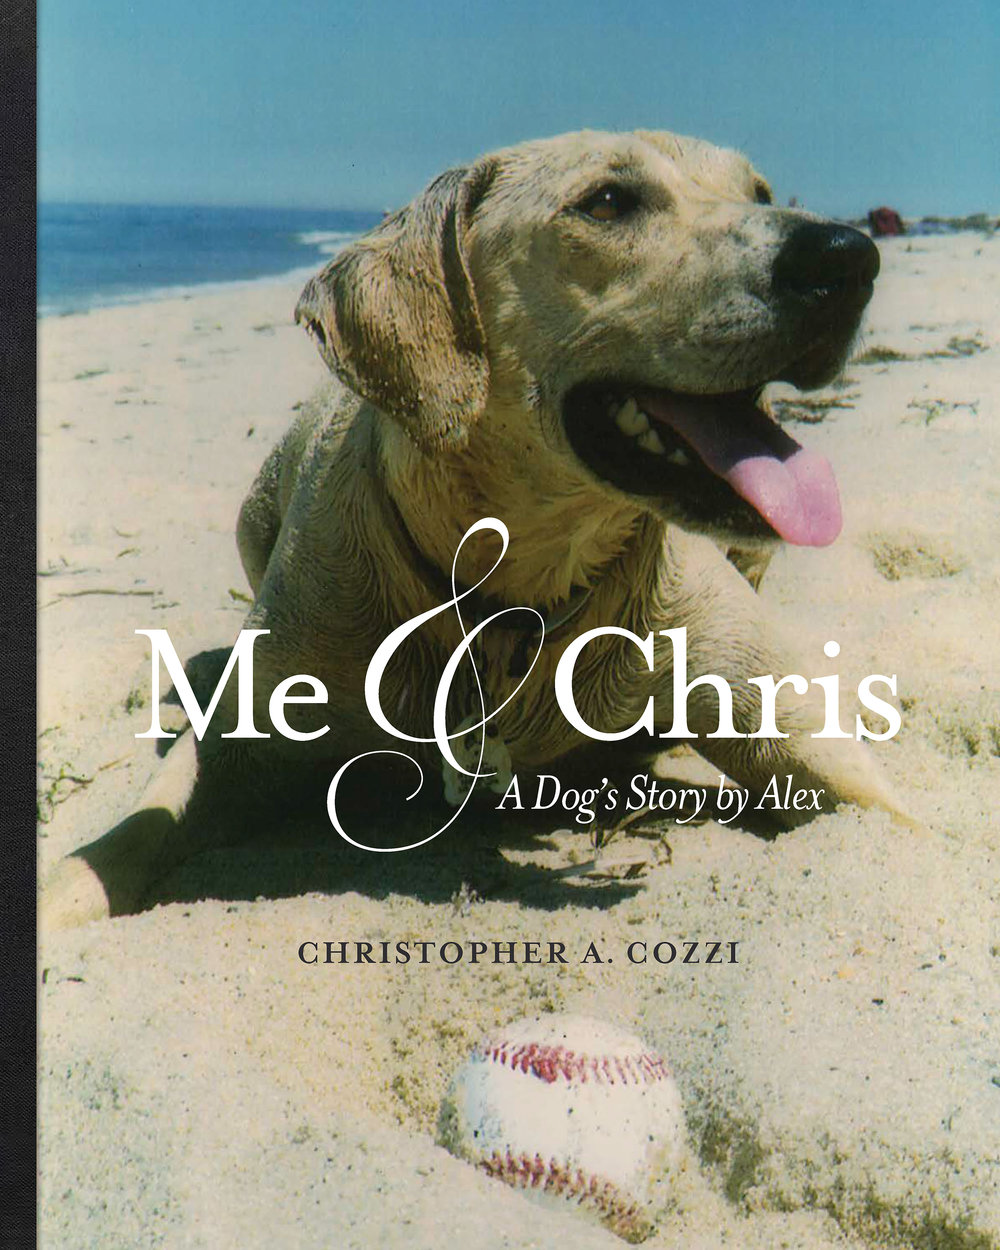 Me&Chris_adogsstorybyalex_cover.jpg